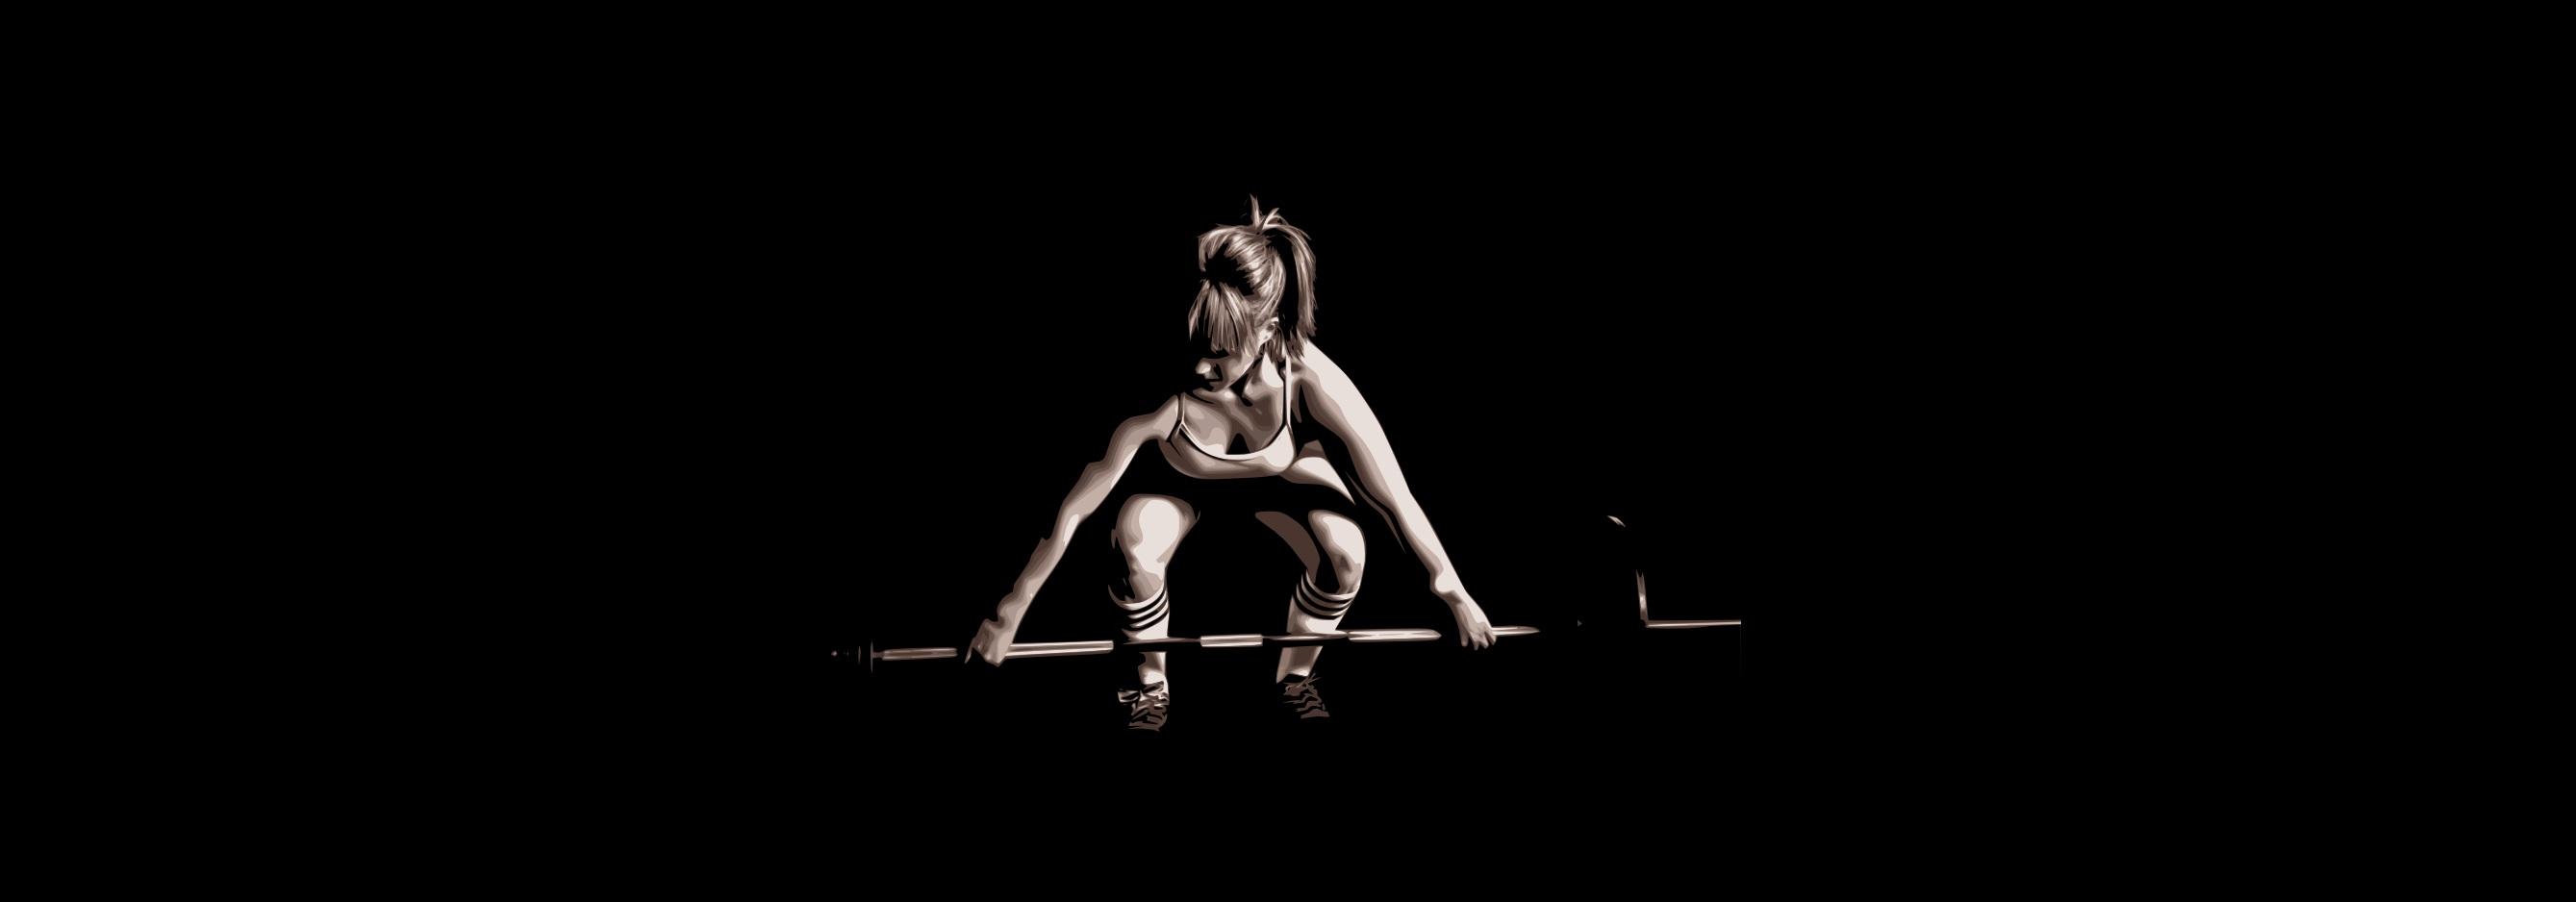 CrossFit 4